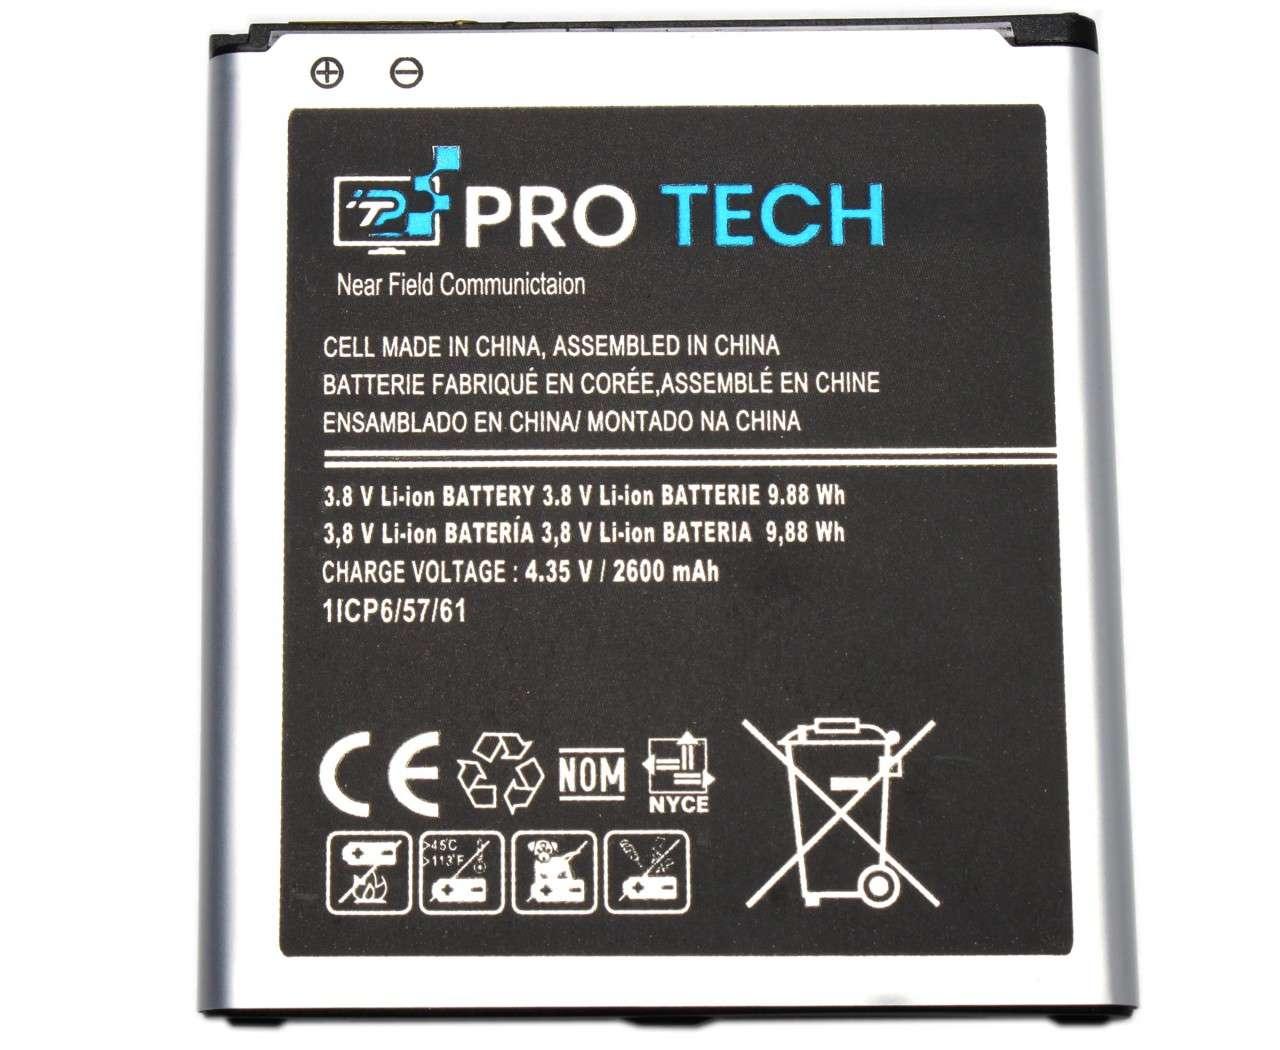 Baterie Acumulator Samsung Galaxy J2 2016 J210 ProTech Premium imagine powerlaptop.ro 2021